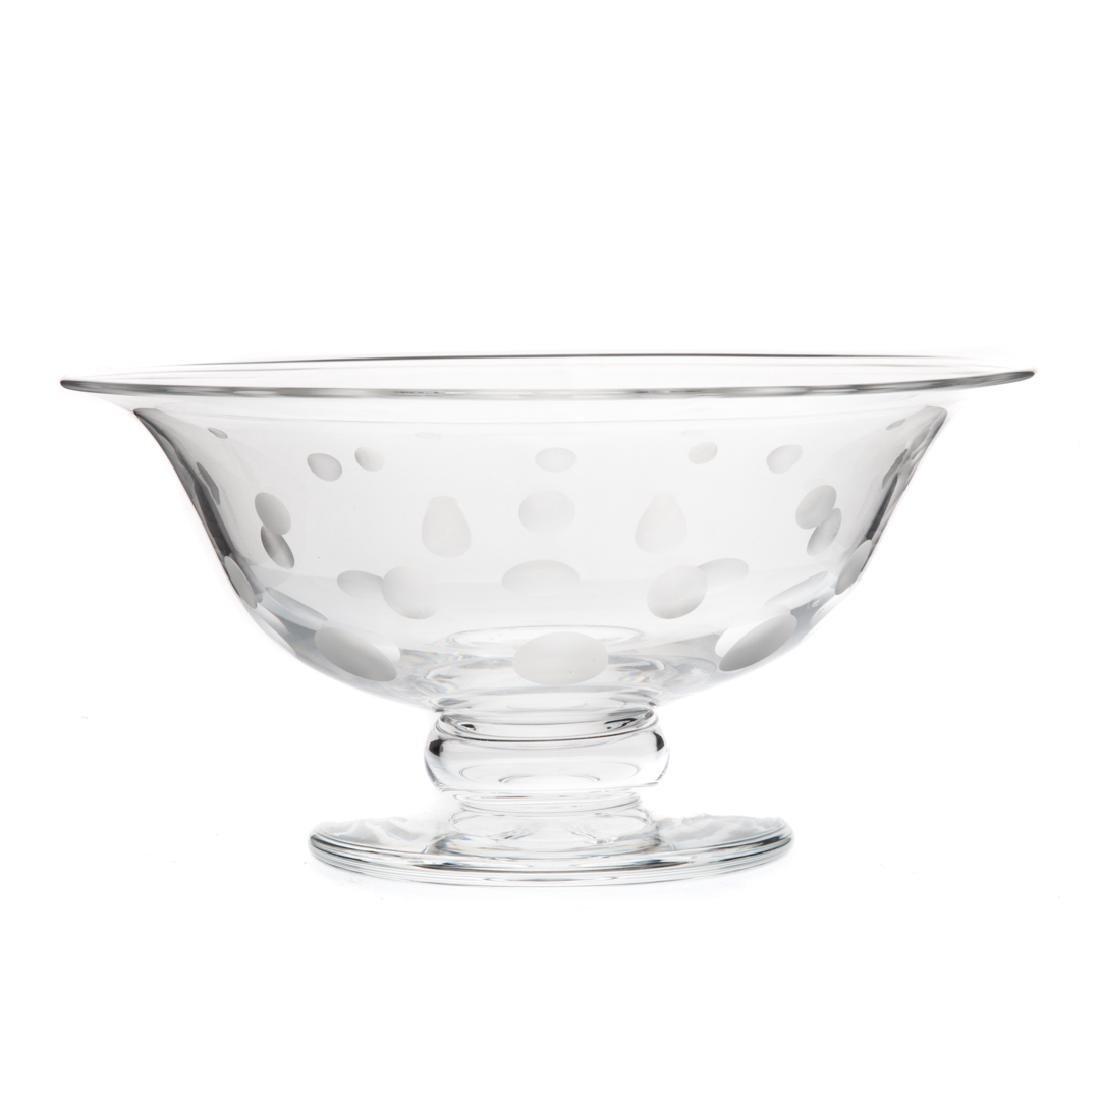 Steuben acid-etched glass compote